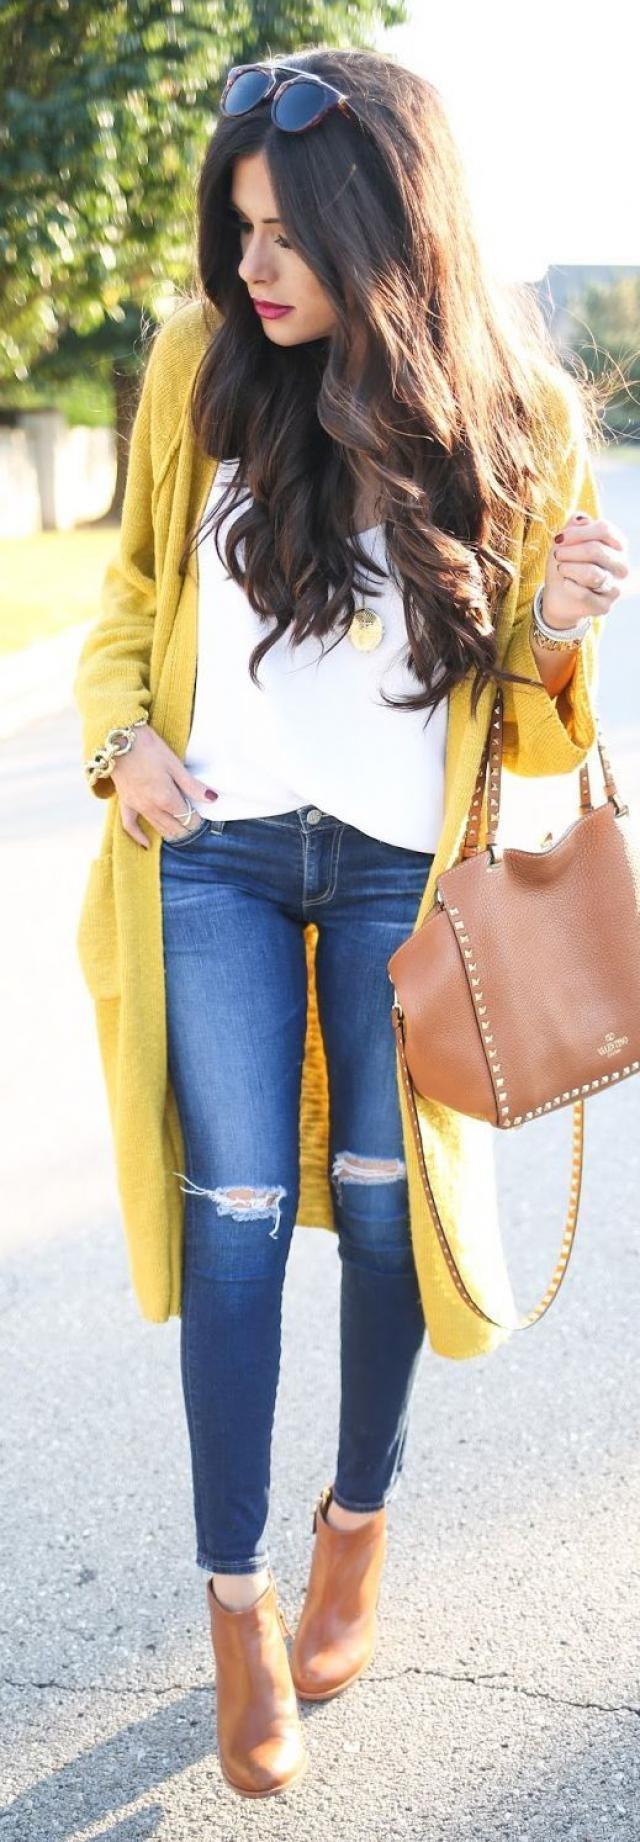 Long yellow sweater, good choice !!